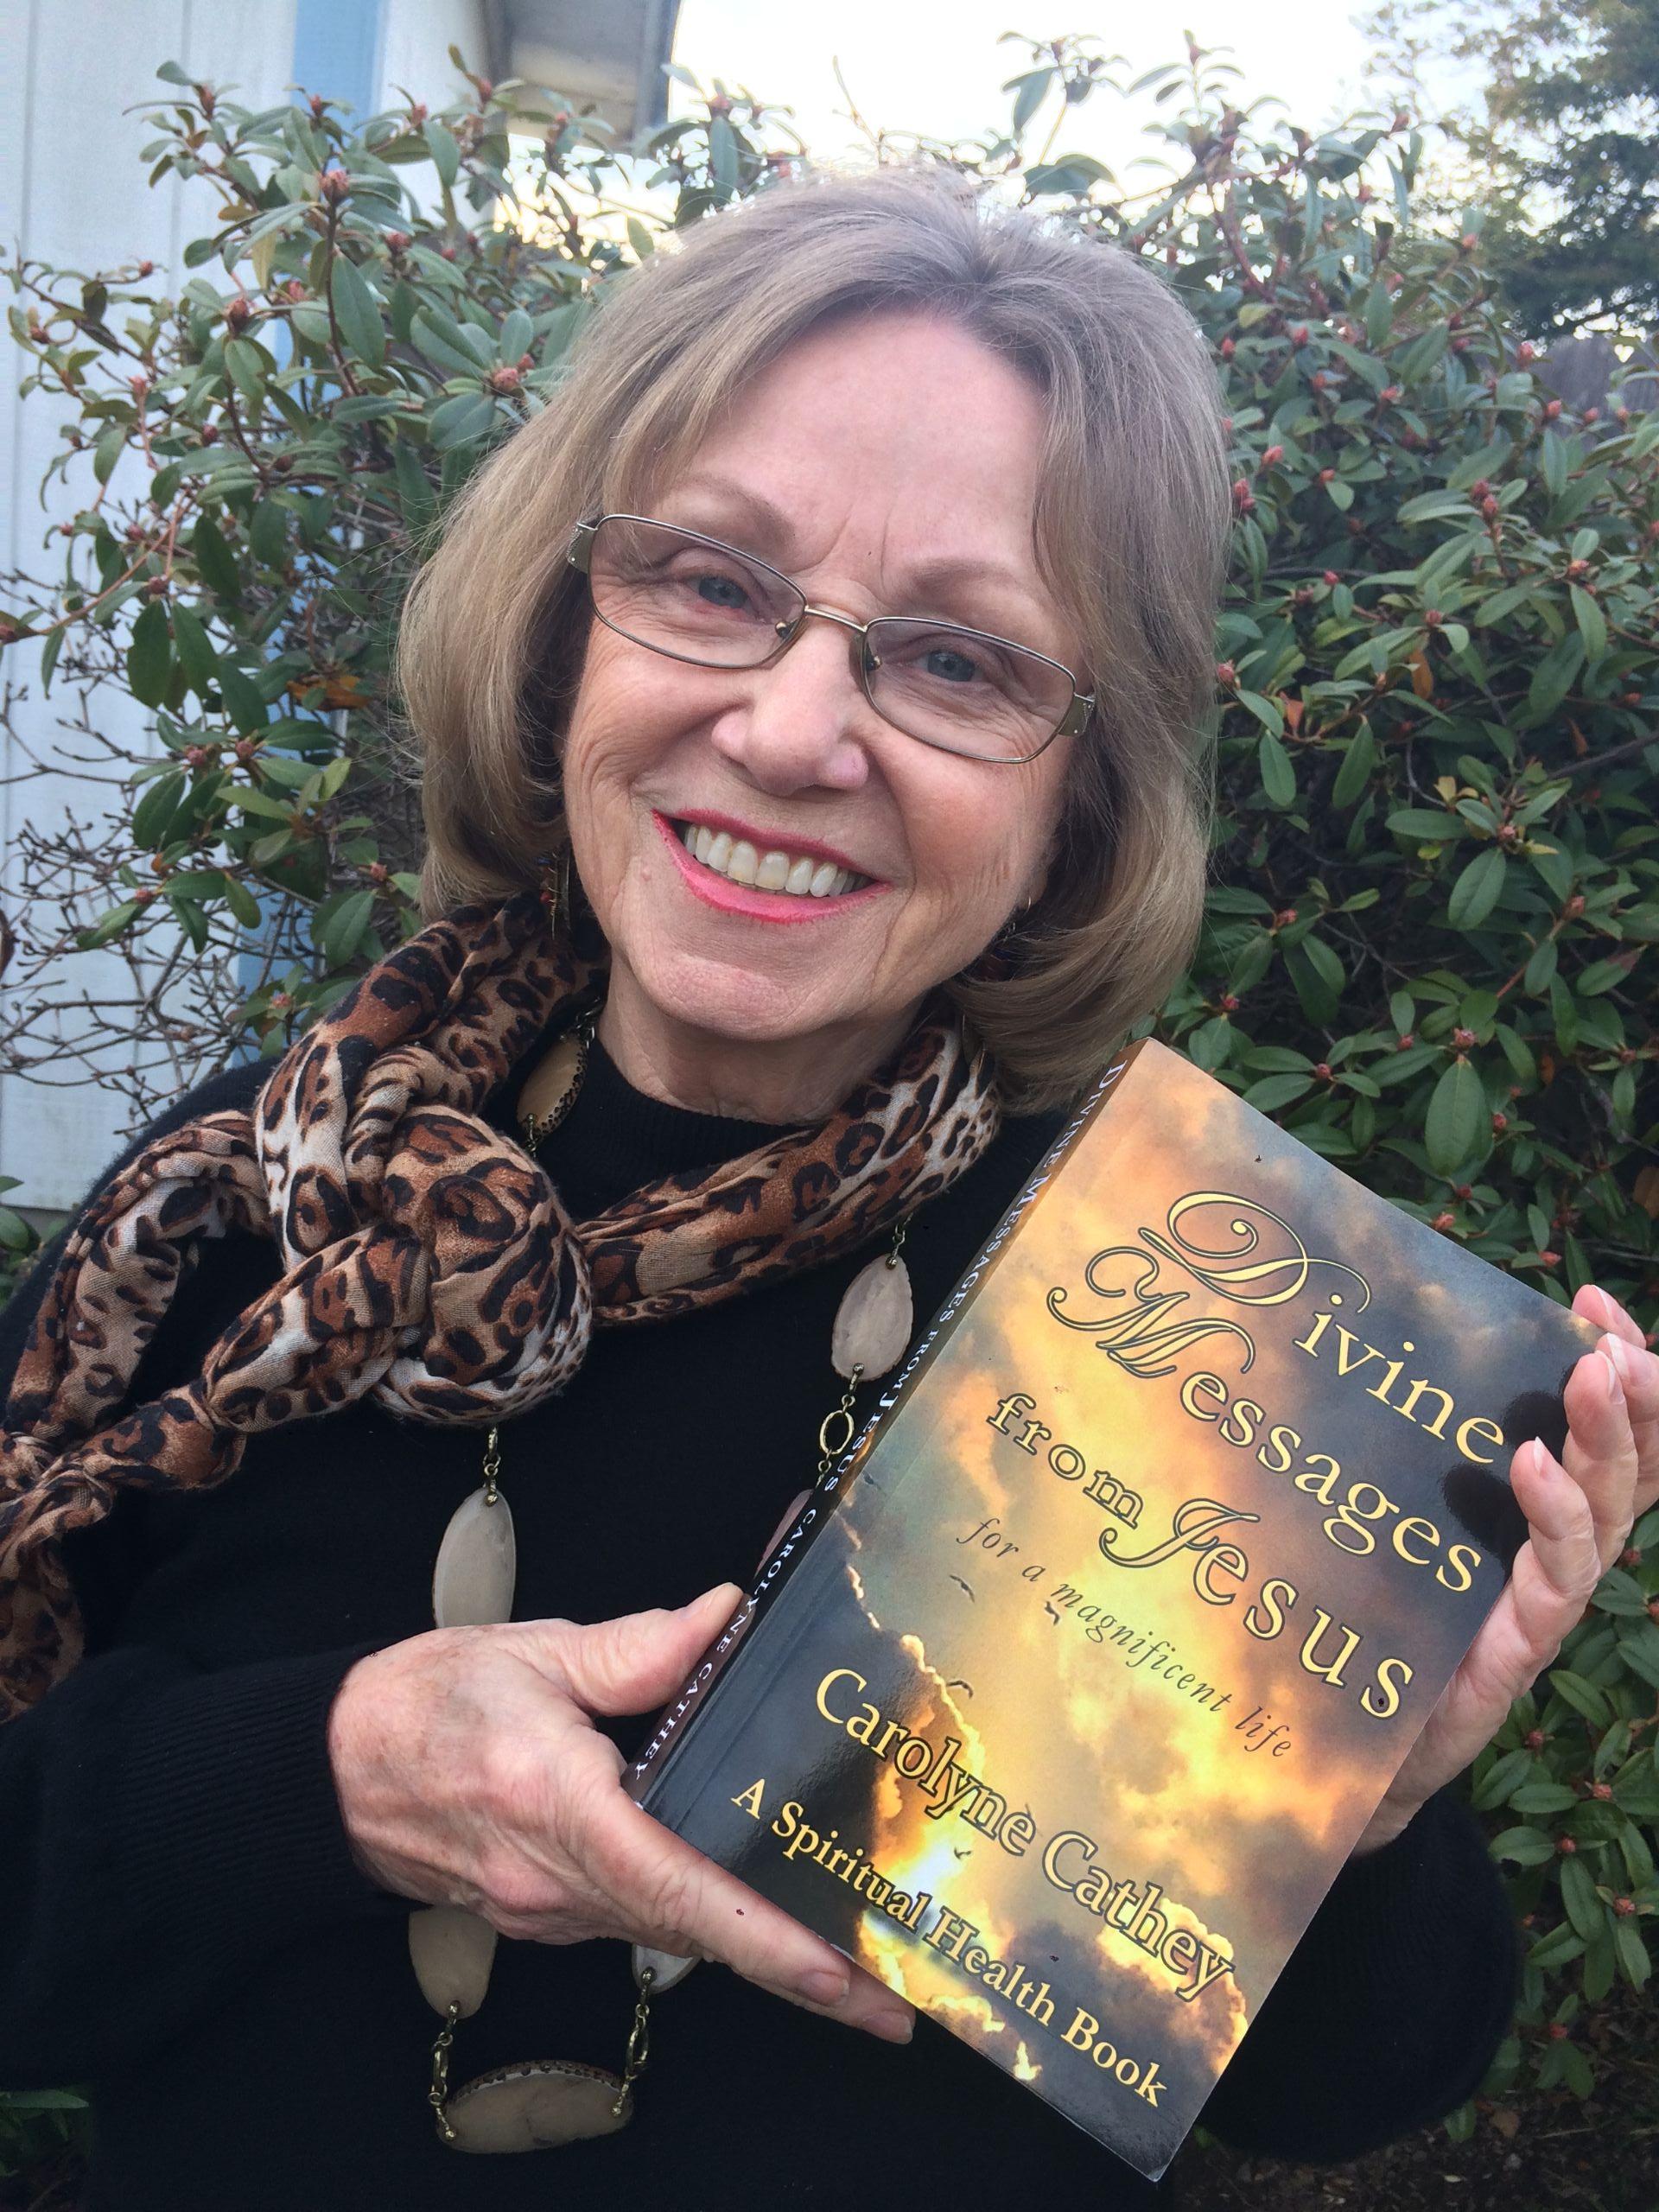 Carolyne photo with book